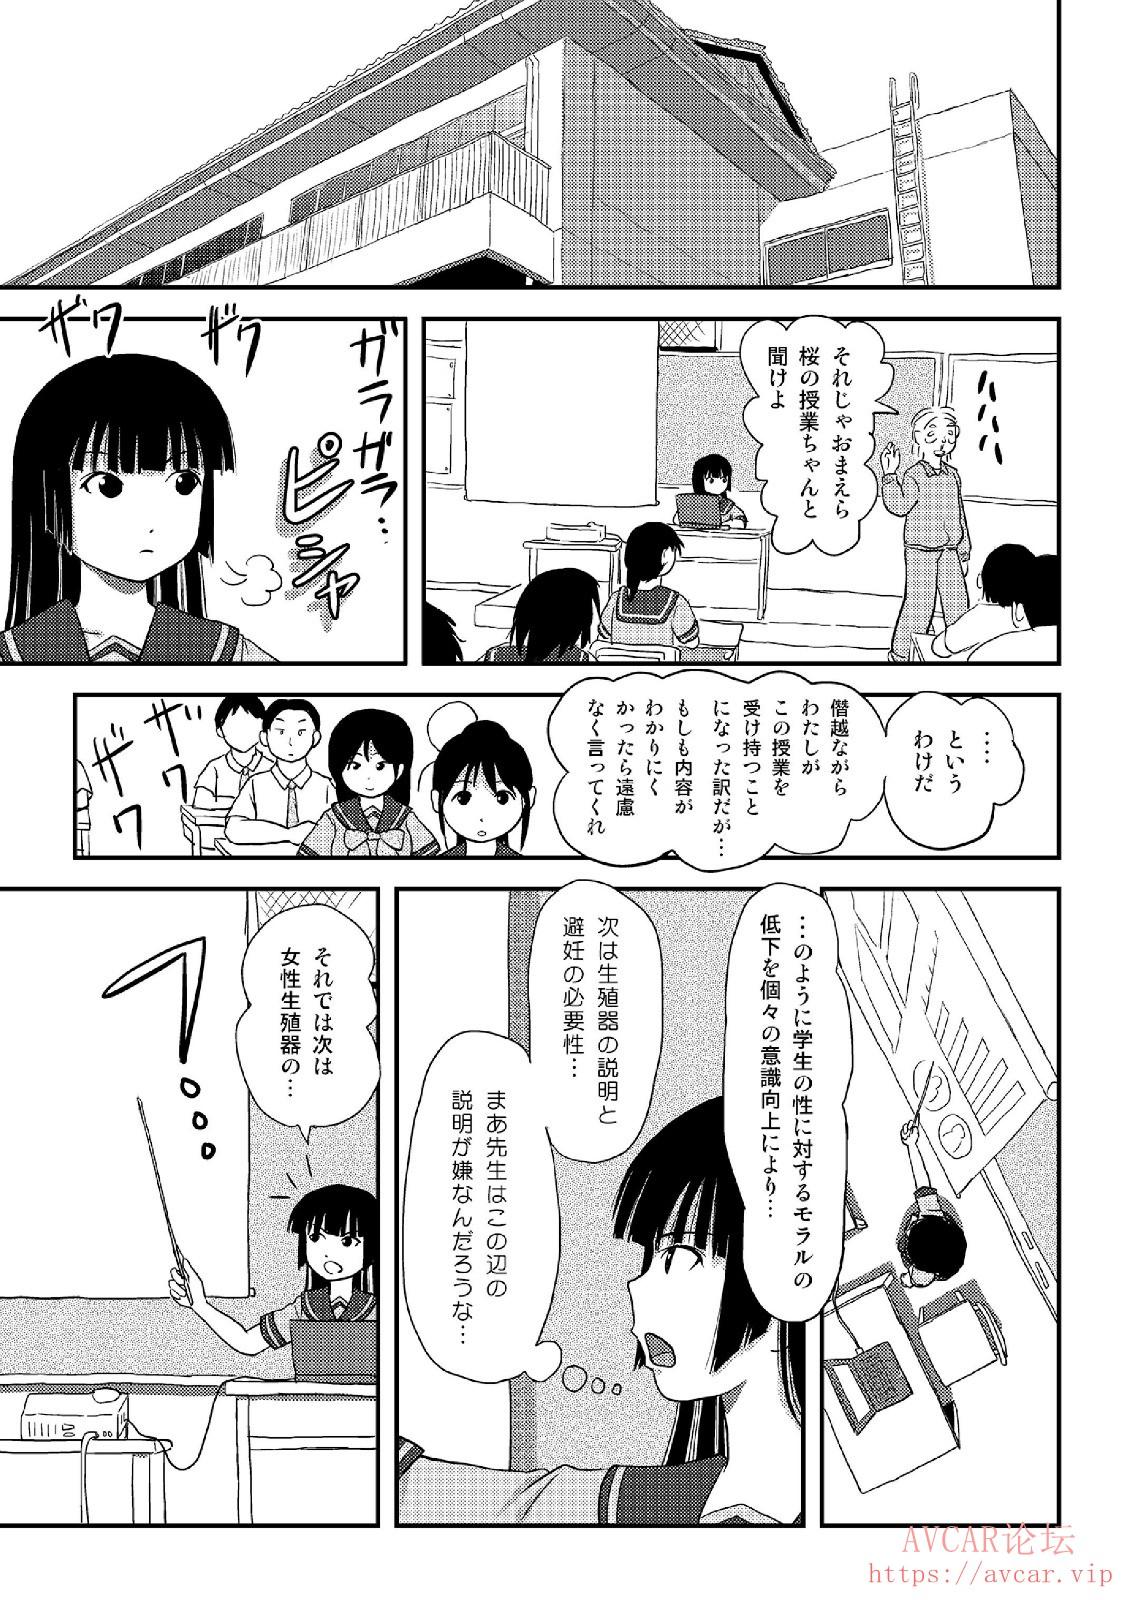 5_page_007.jpg